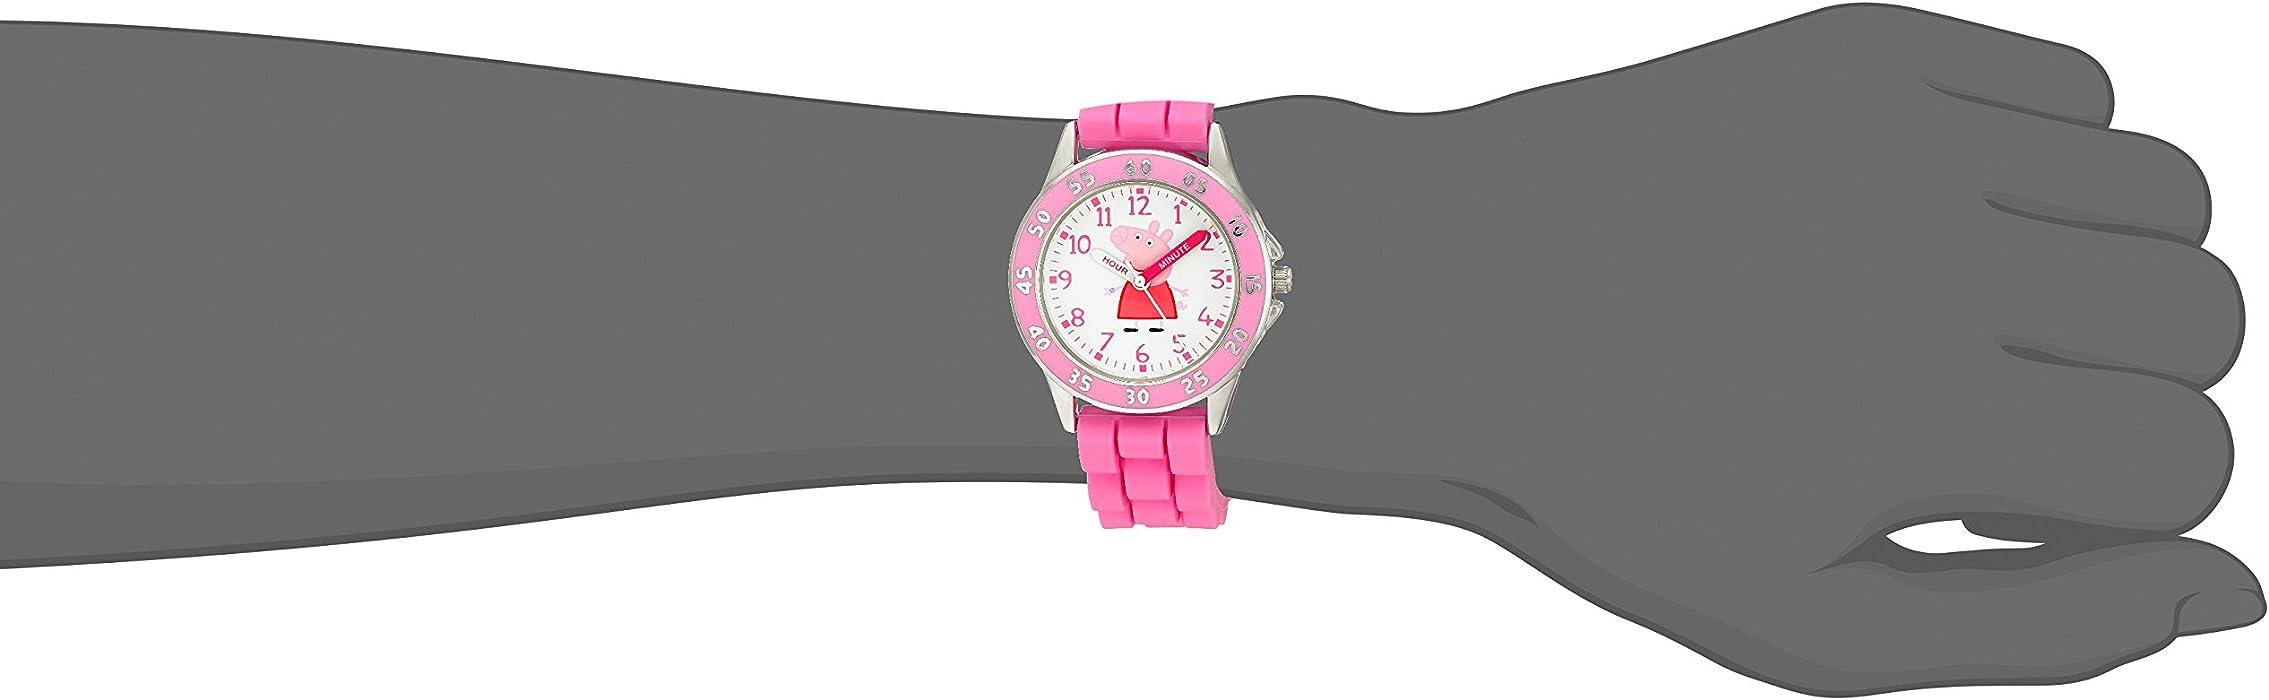 Kids PPG9000 Analog Display Japanese Quartz Pink Watch. Peppa Pig ...